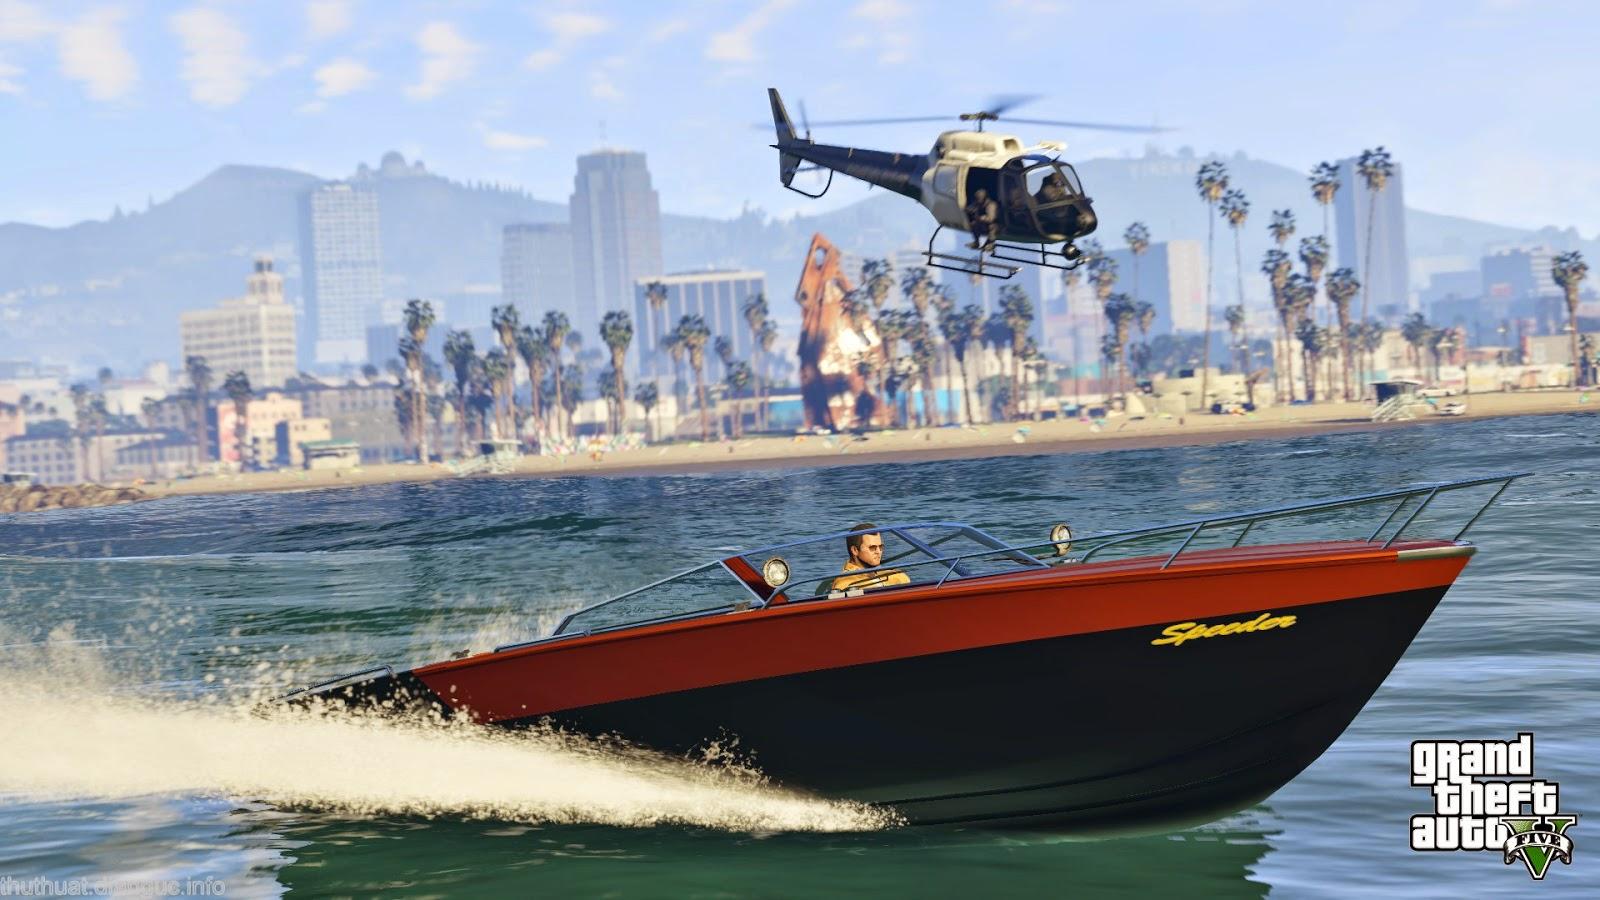 Download Game gta 2015, PC Grand Theft Auto V 2015